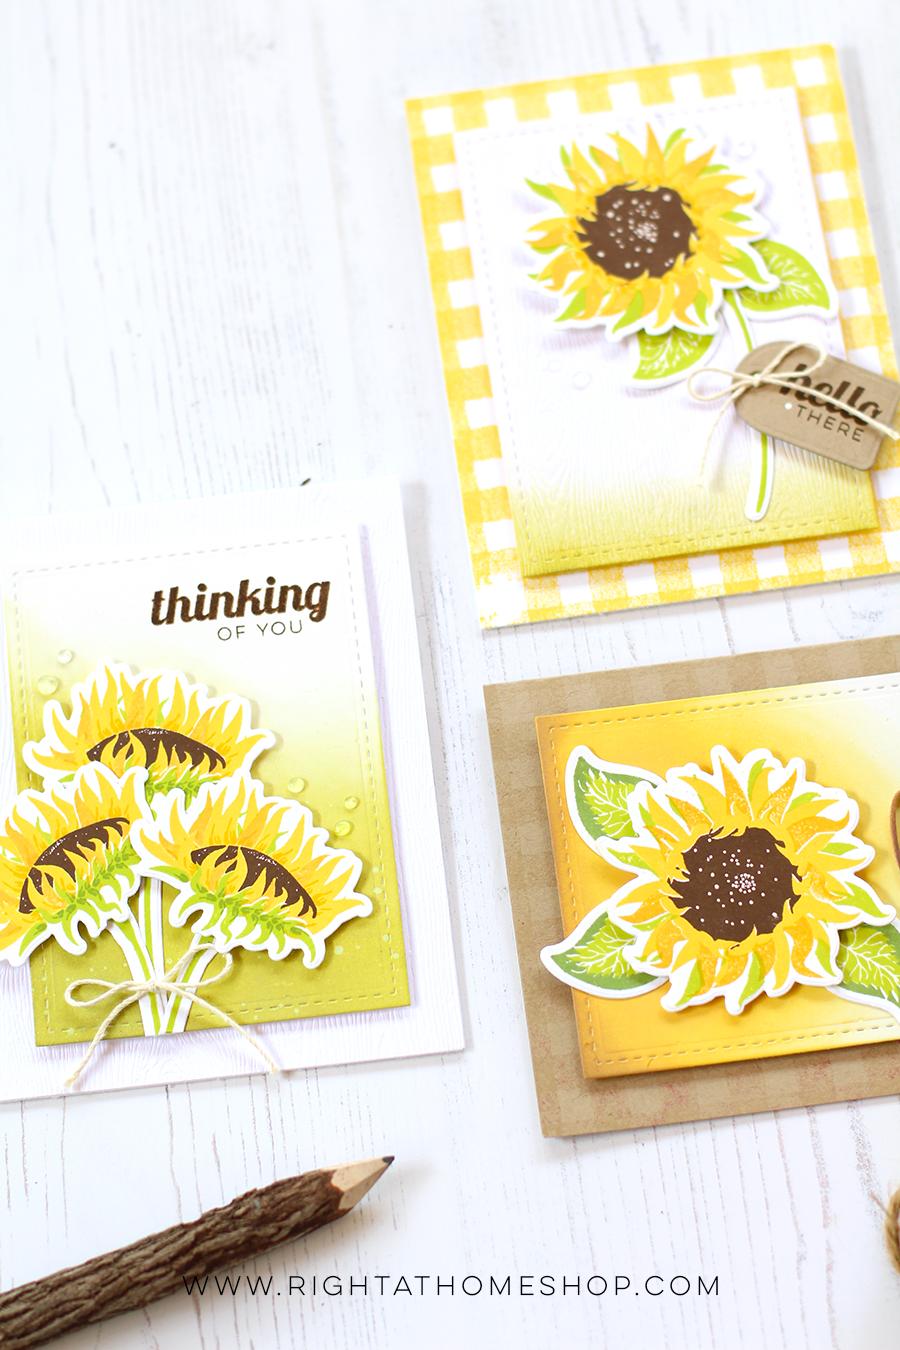 3 Sunflower Cards by Nicole // rightathomeshop.com/blog